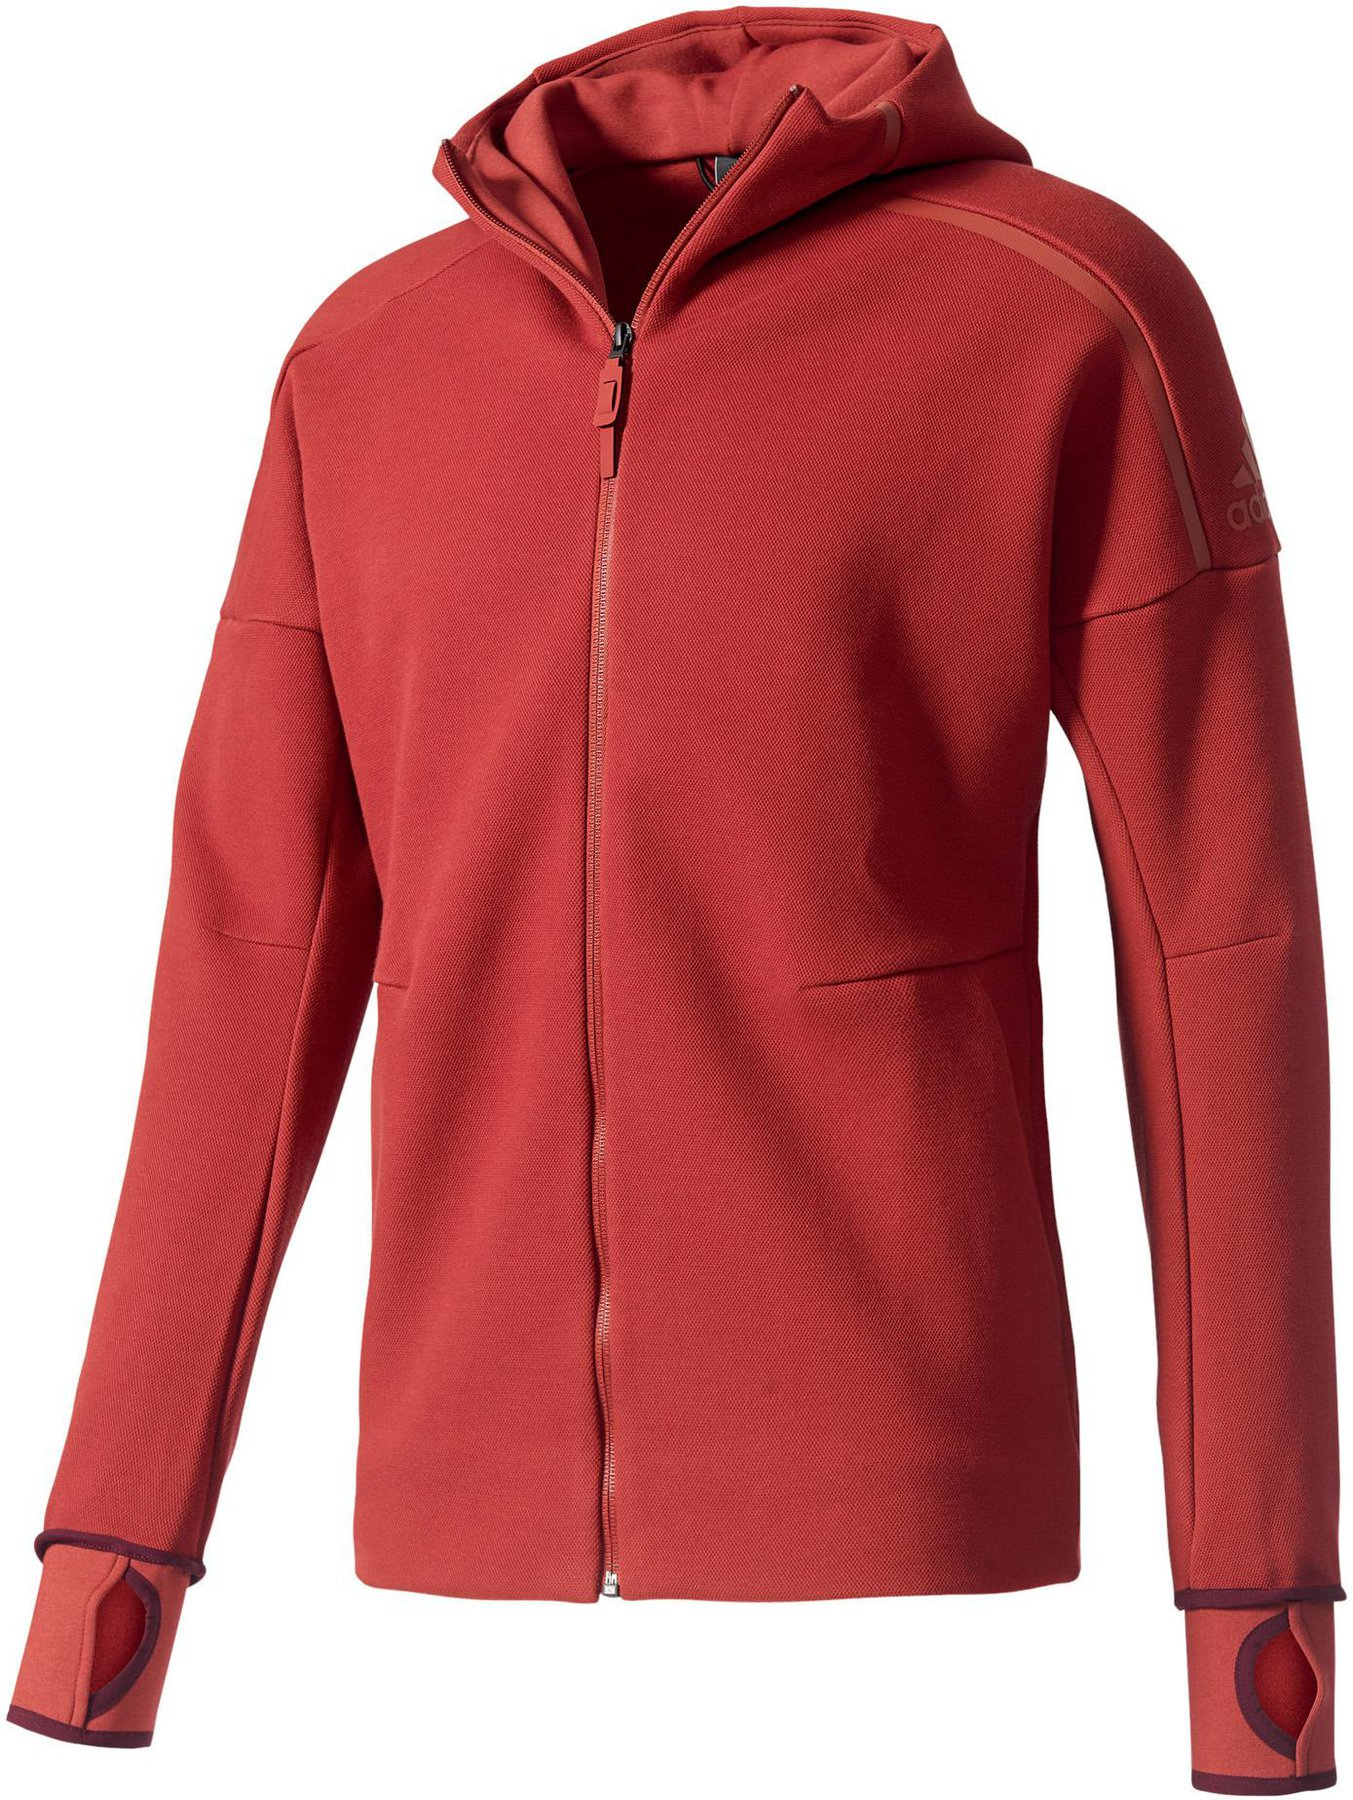 Adidas Jacke Gr. S XL schwarz hoodie